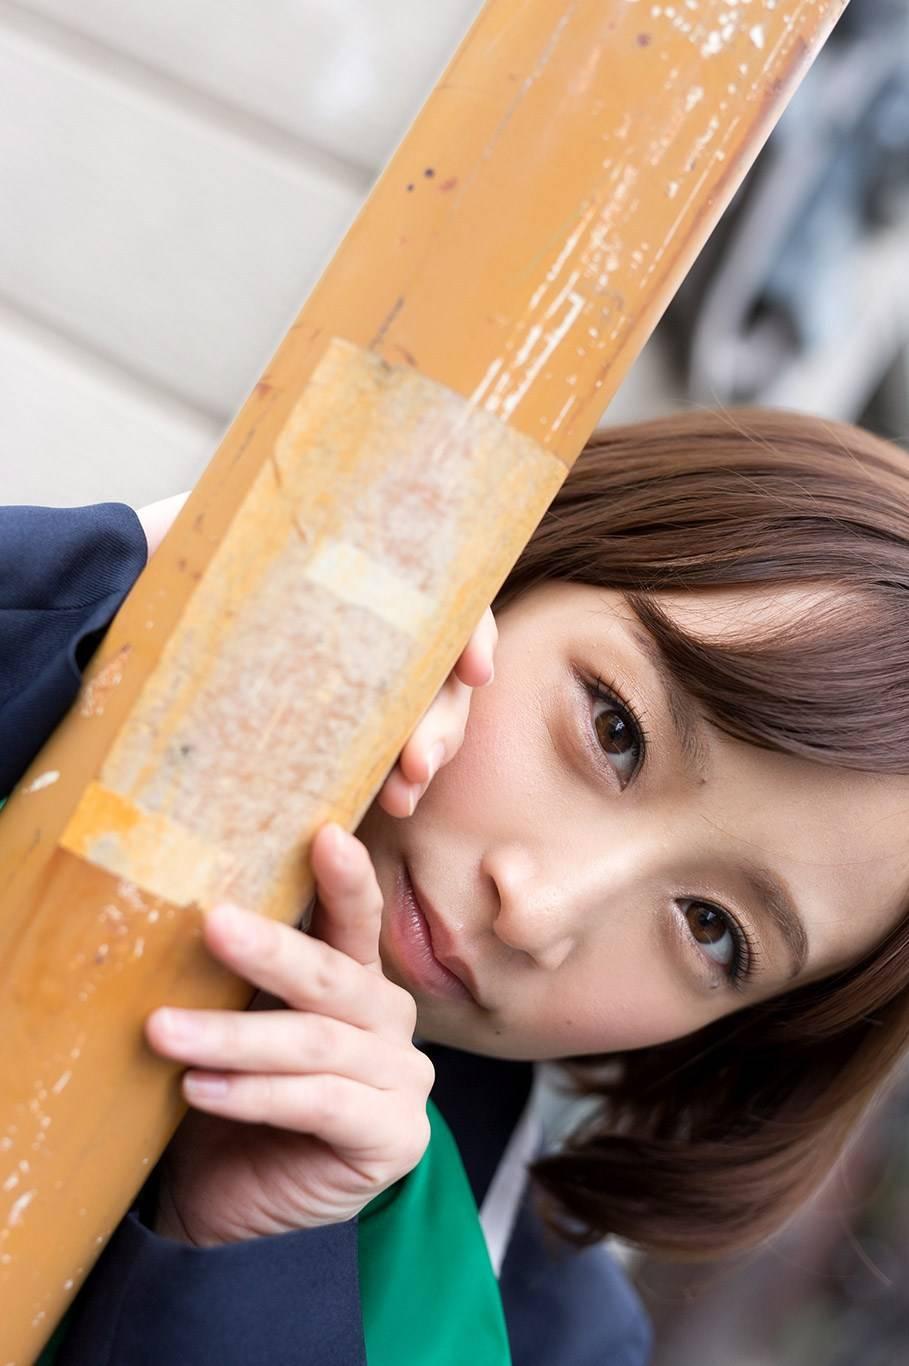 foto bugil artis bokep toket cilik dari jepang,ayumi kimino,cewek jepang toket cilik pose telanjang